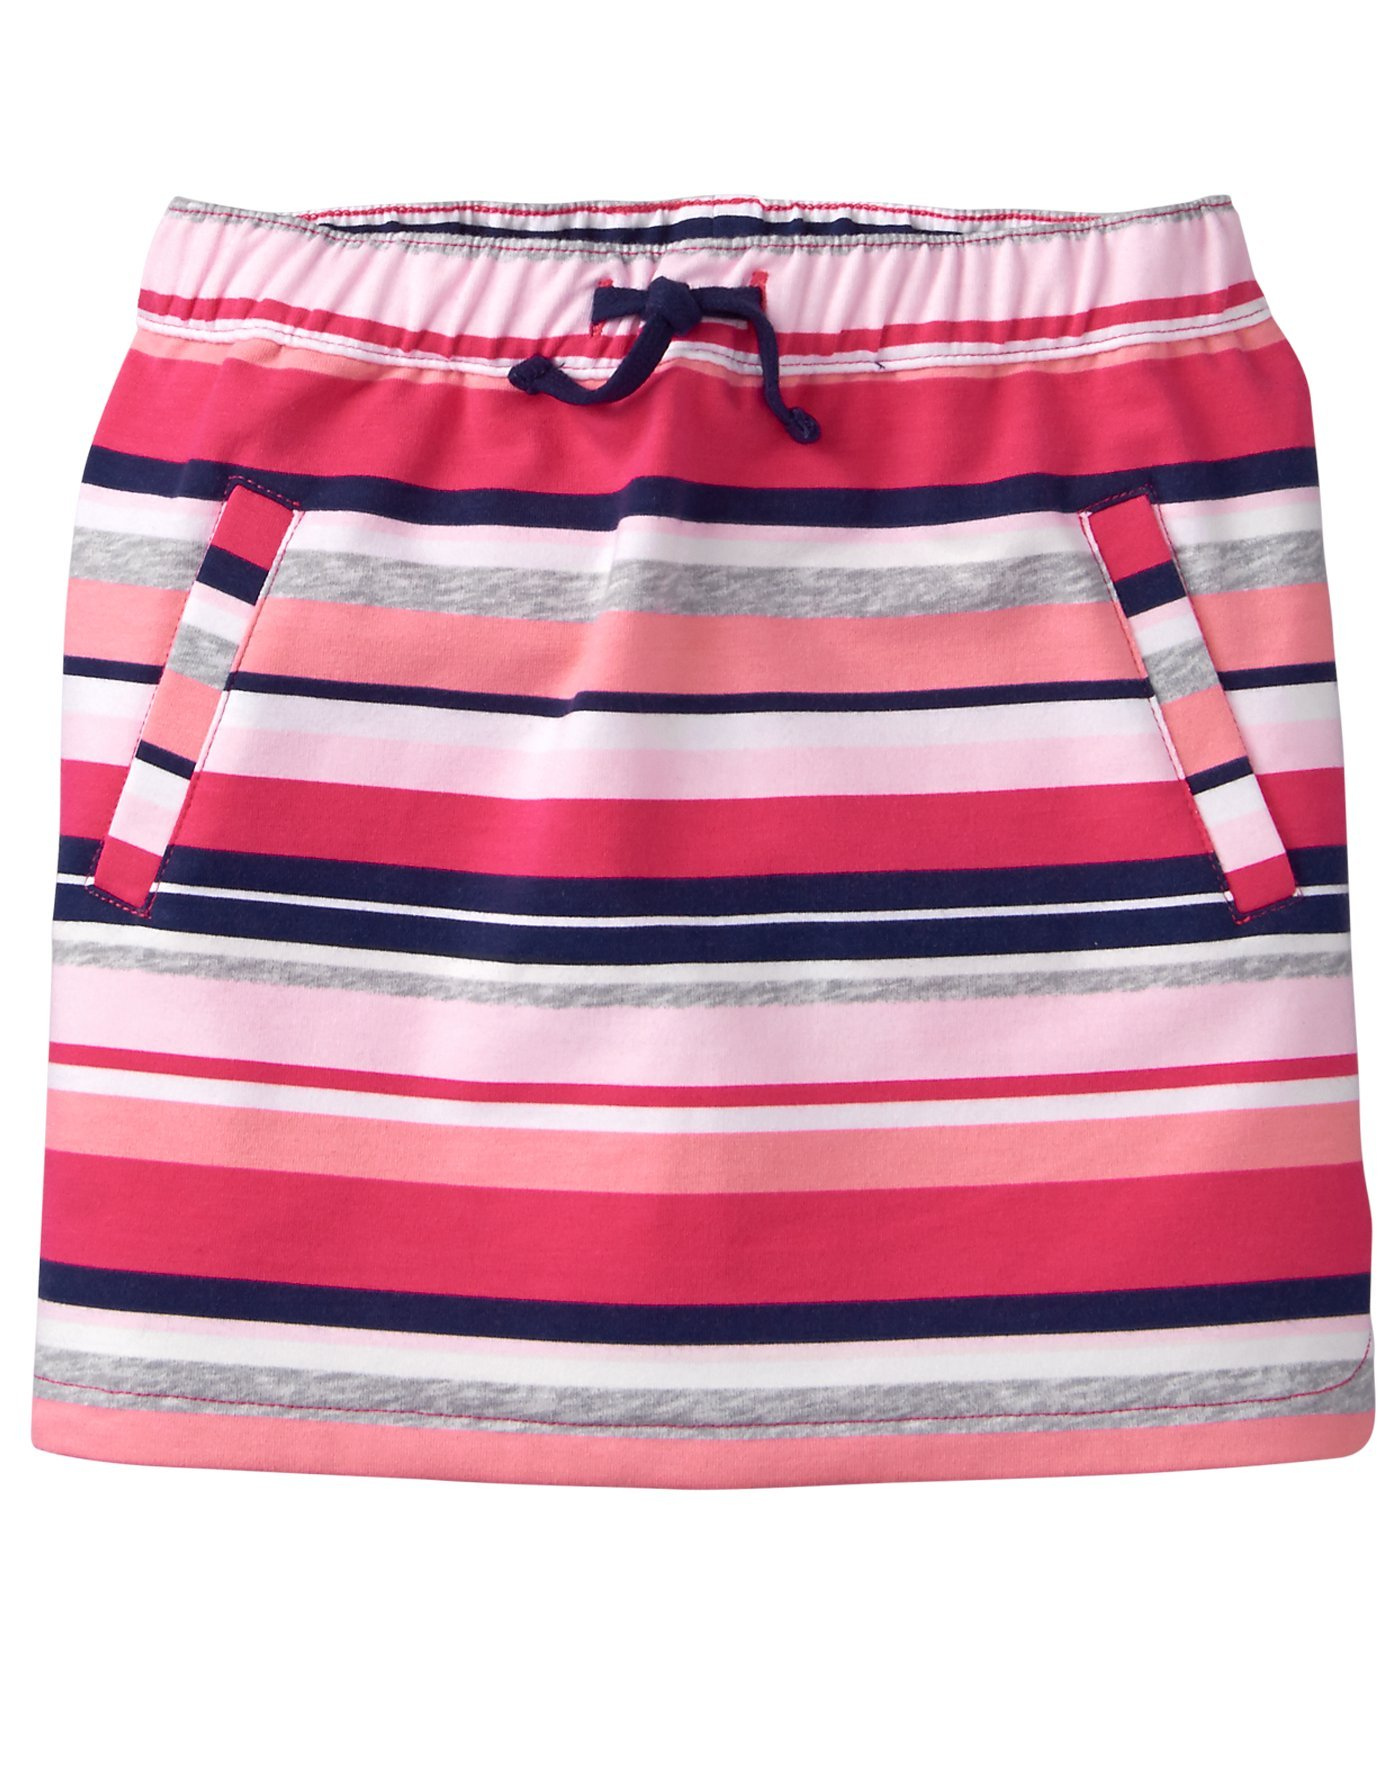 Gymboree Little Girls' Drawstring Front Pocket Knit Skirt, Pink/Grey Stripe, S